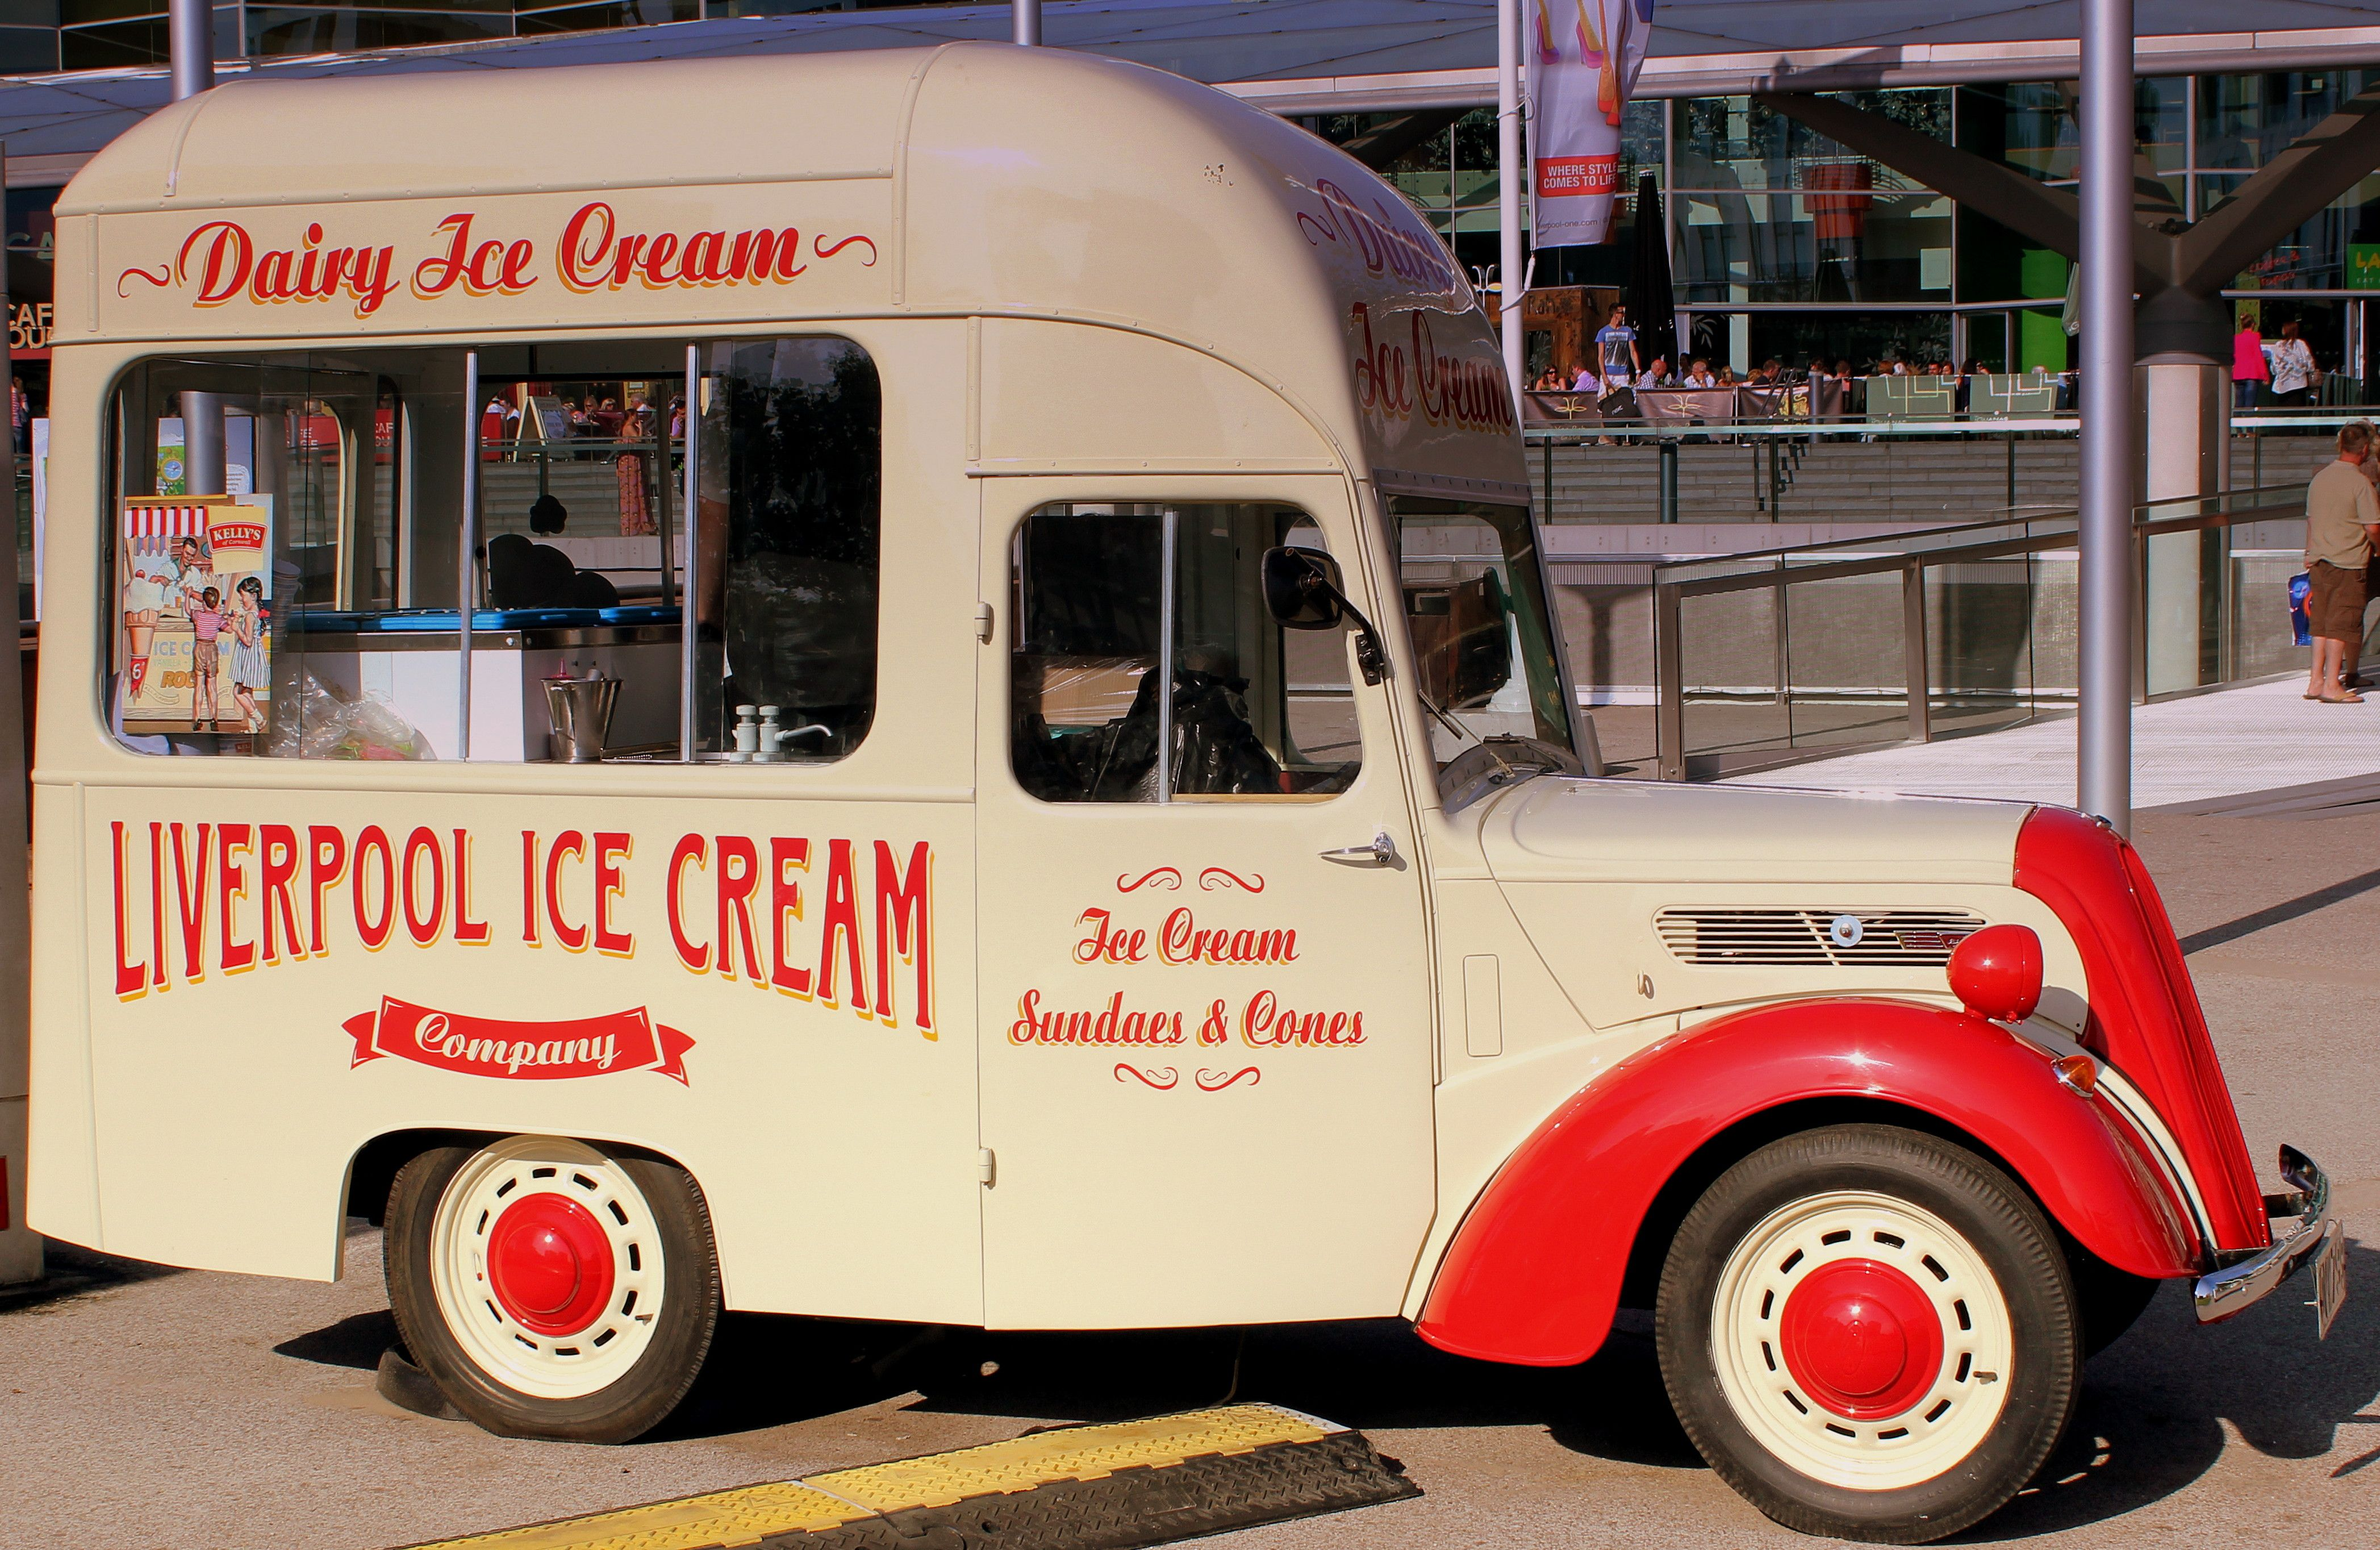 1950s Thames Ford Anglia Icecream Van Ice Cream Van Liverpool Ice Cream Companies